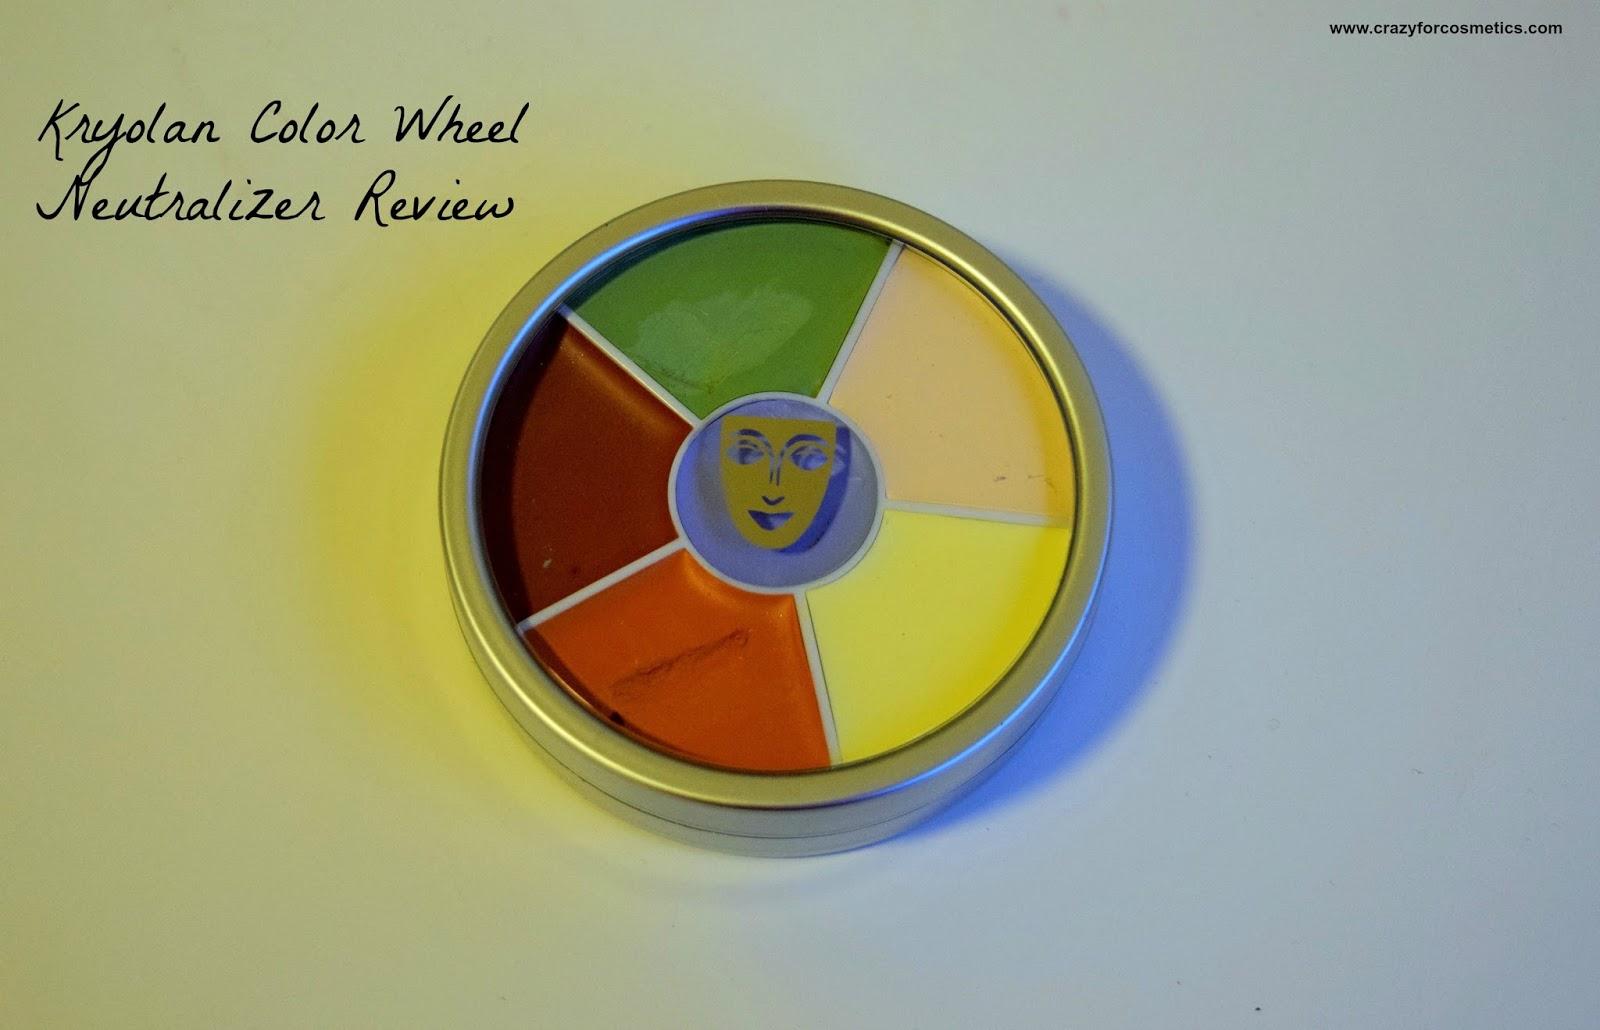 Kryolan Color Wheel Concealer Circle Neutralizer How